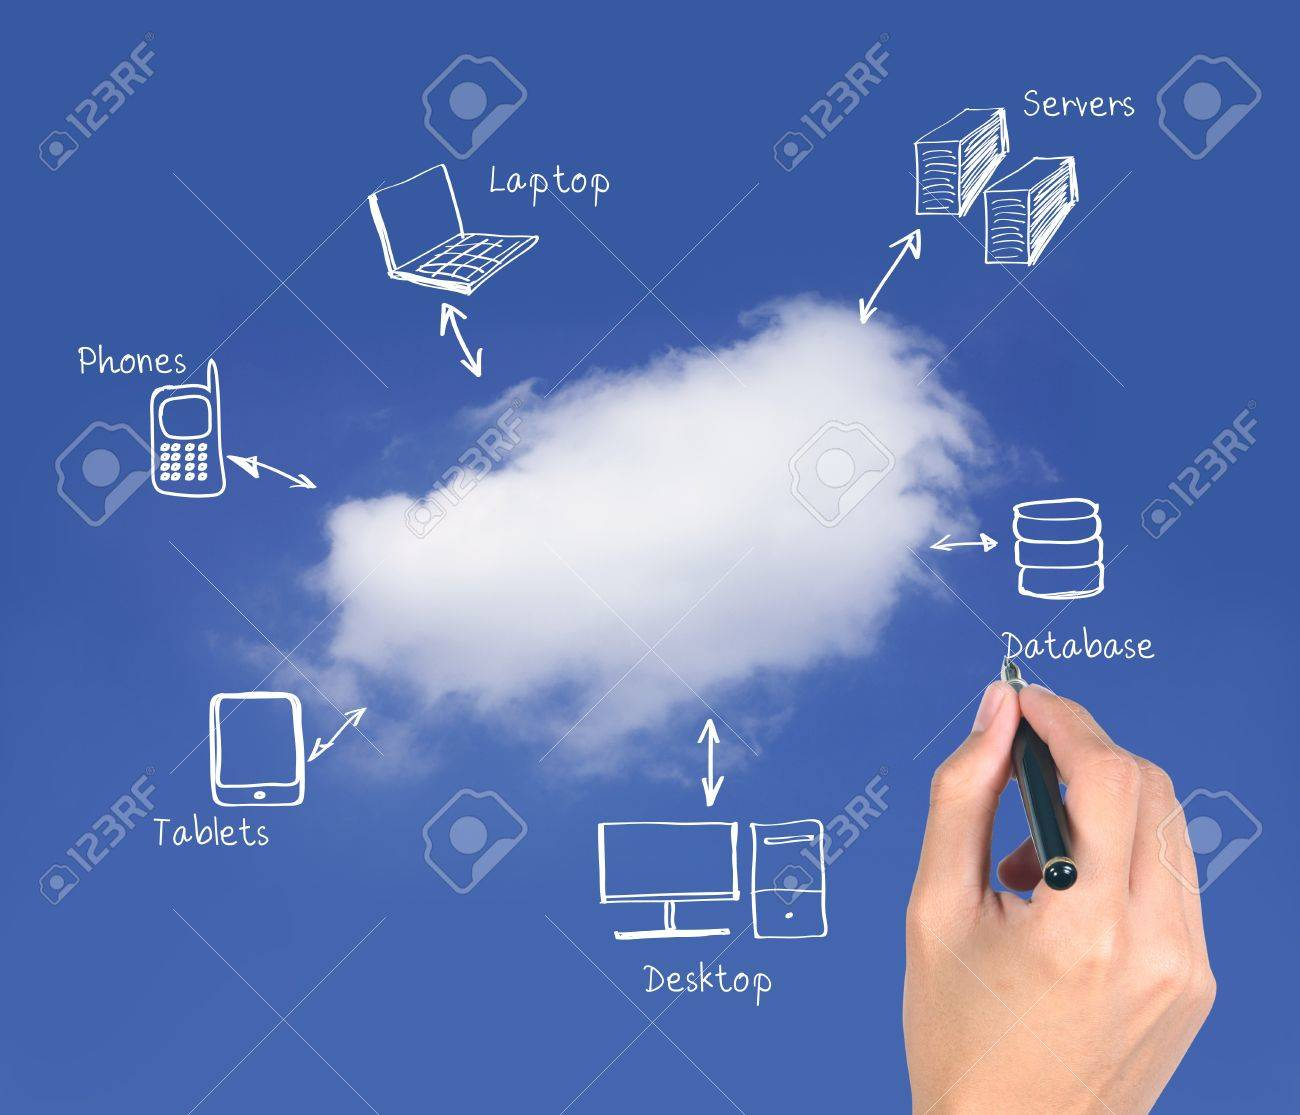 cloud computing network diagram Stock Photo - 10334025